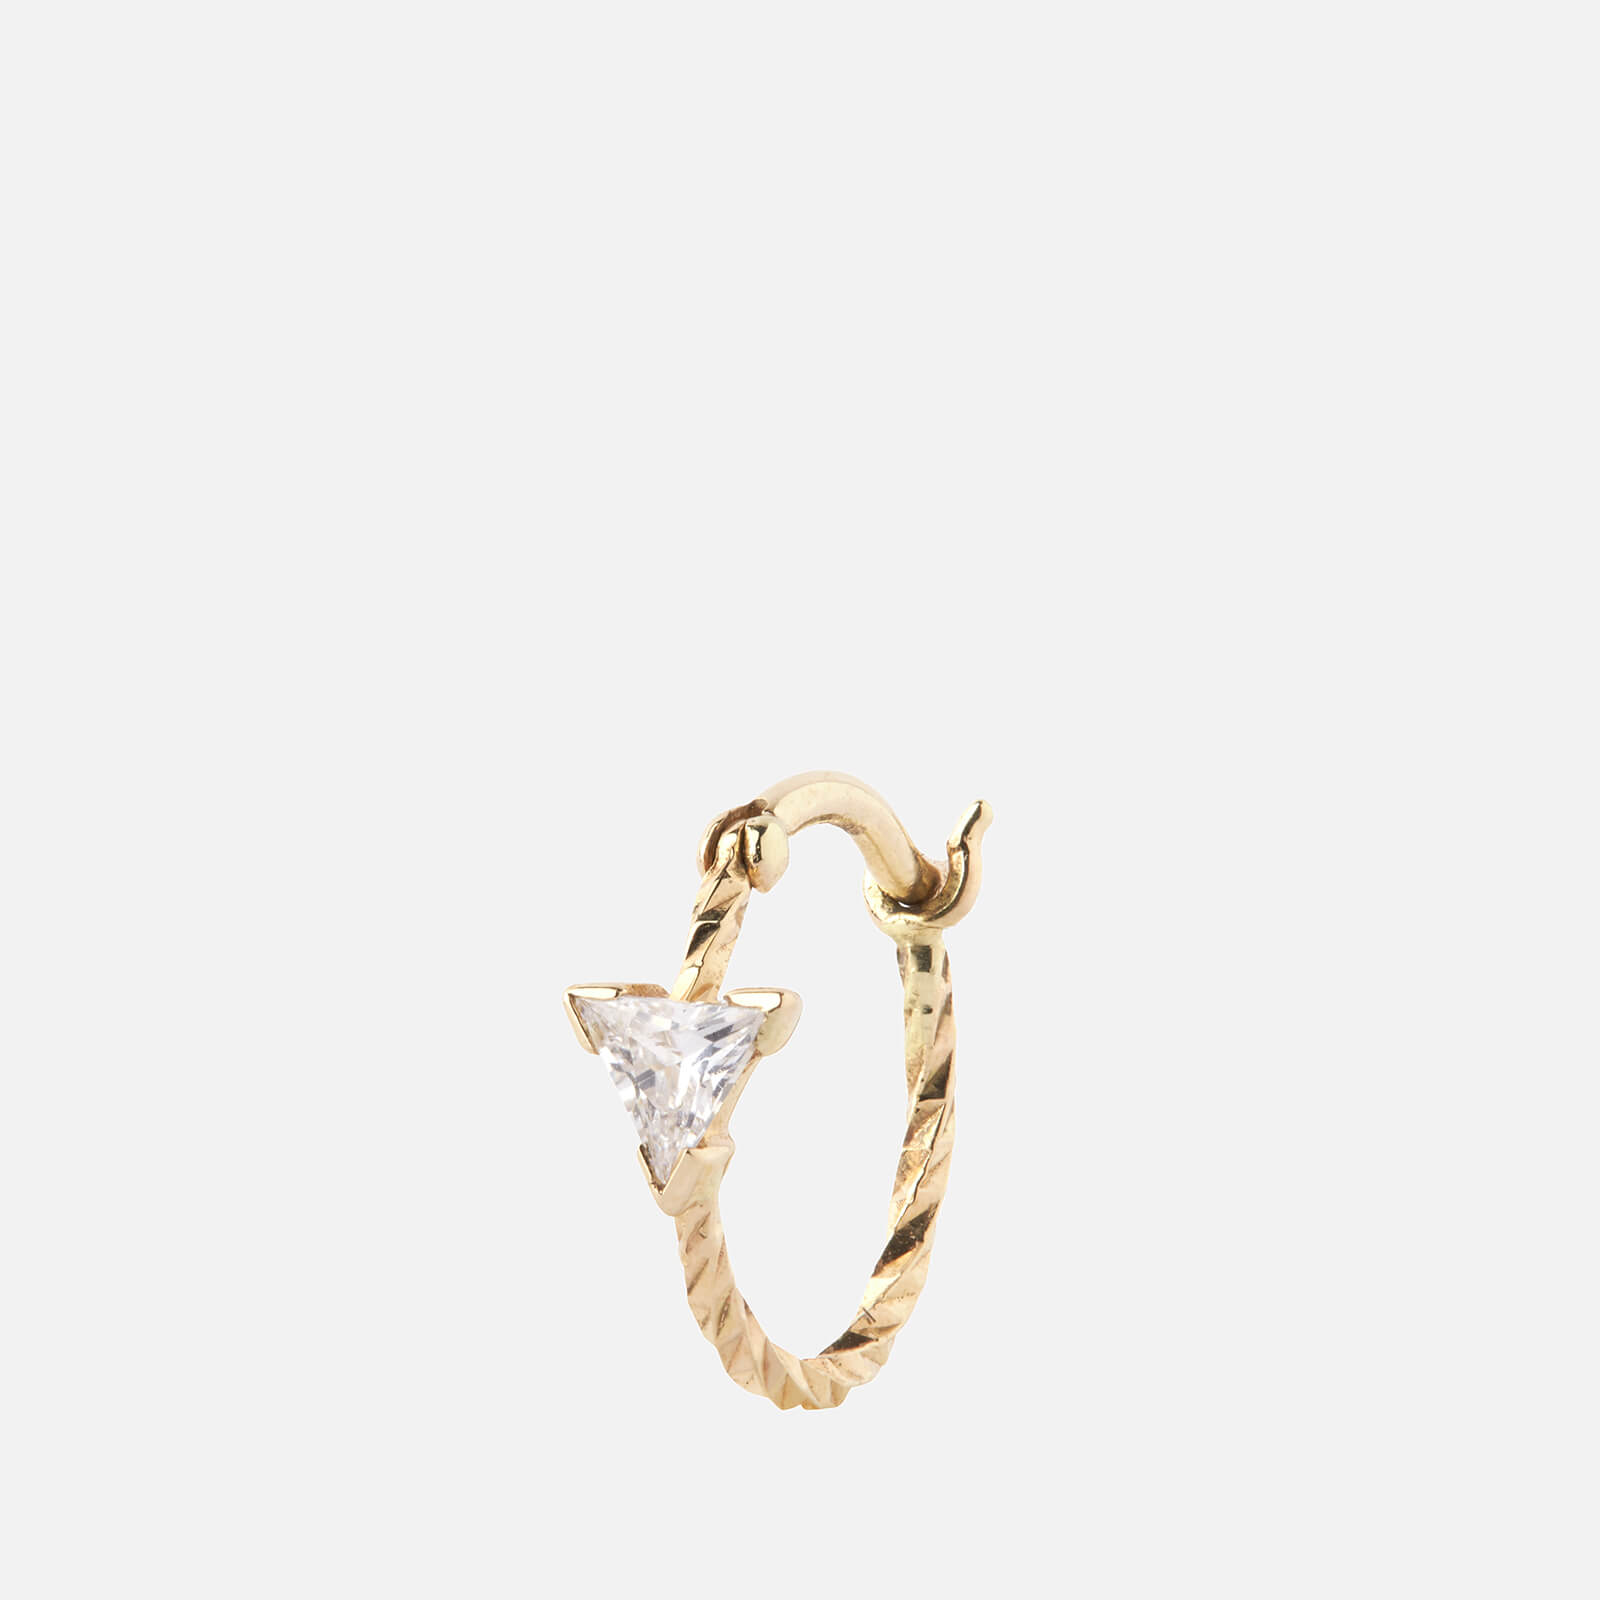 Maria Black Women's Viper Earring - Gold